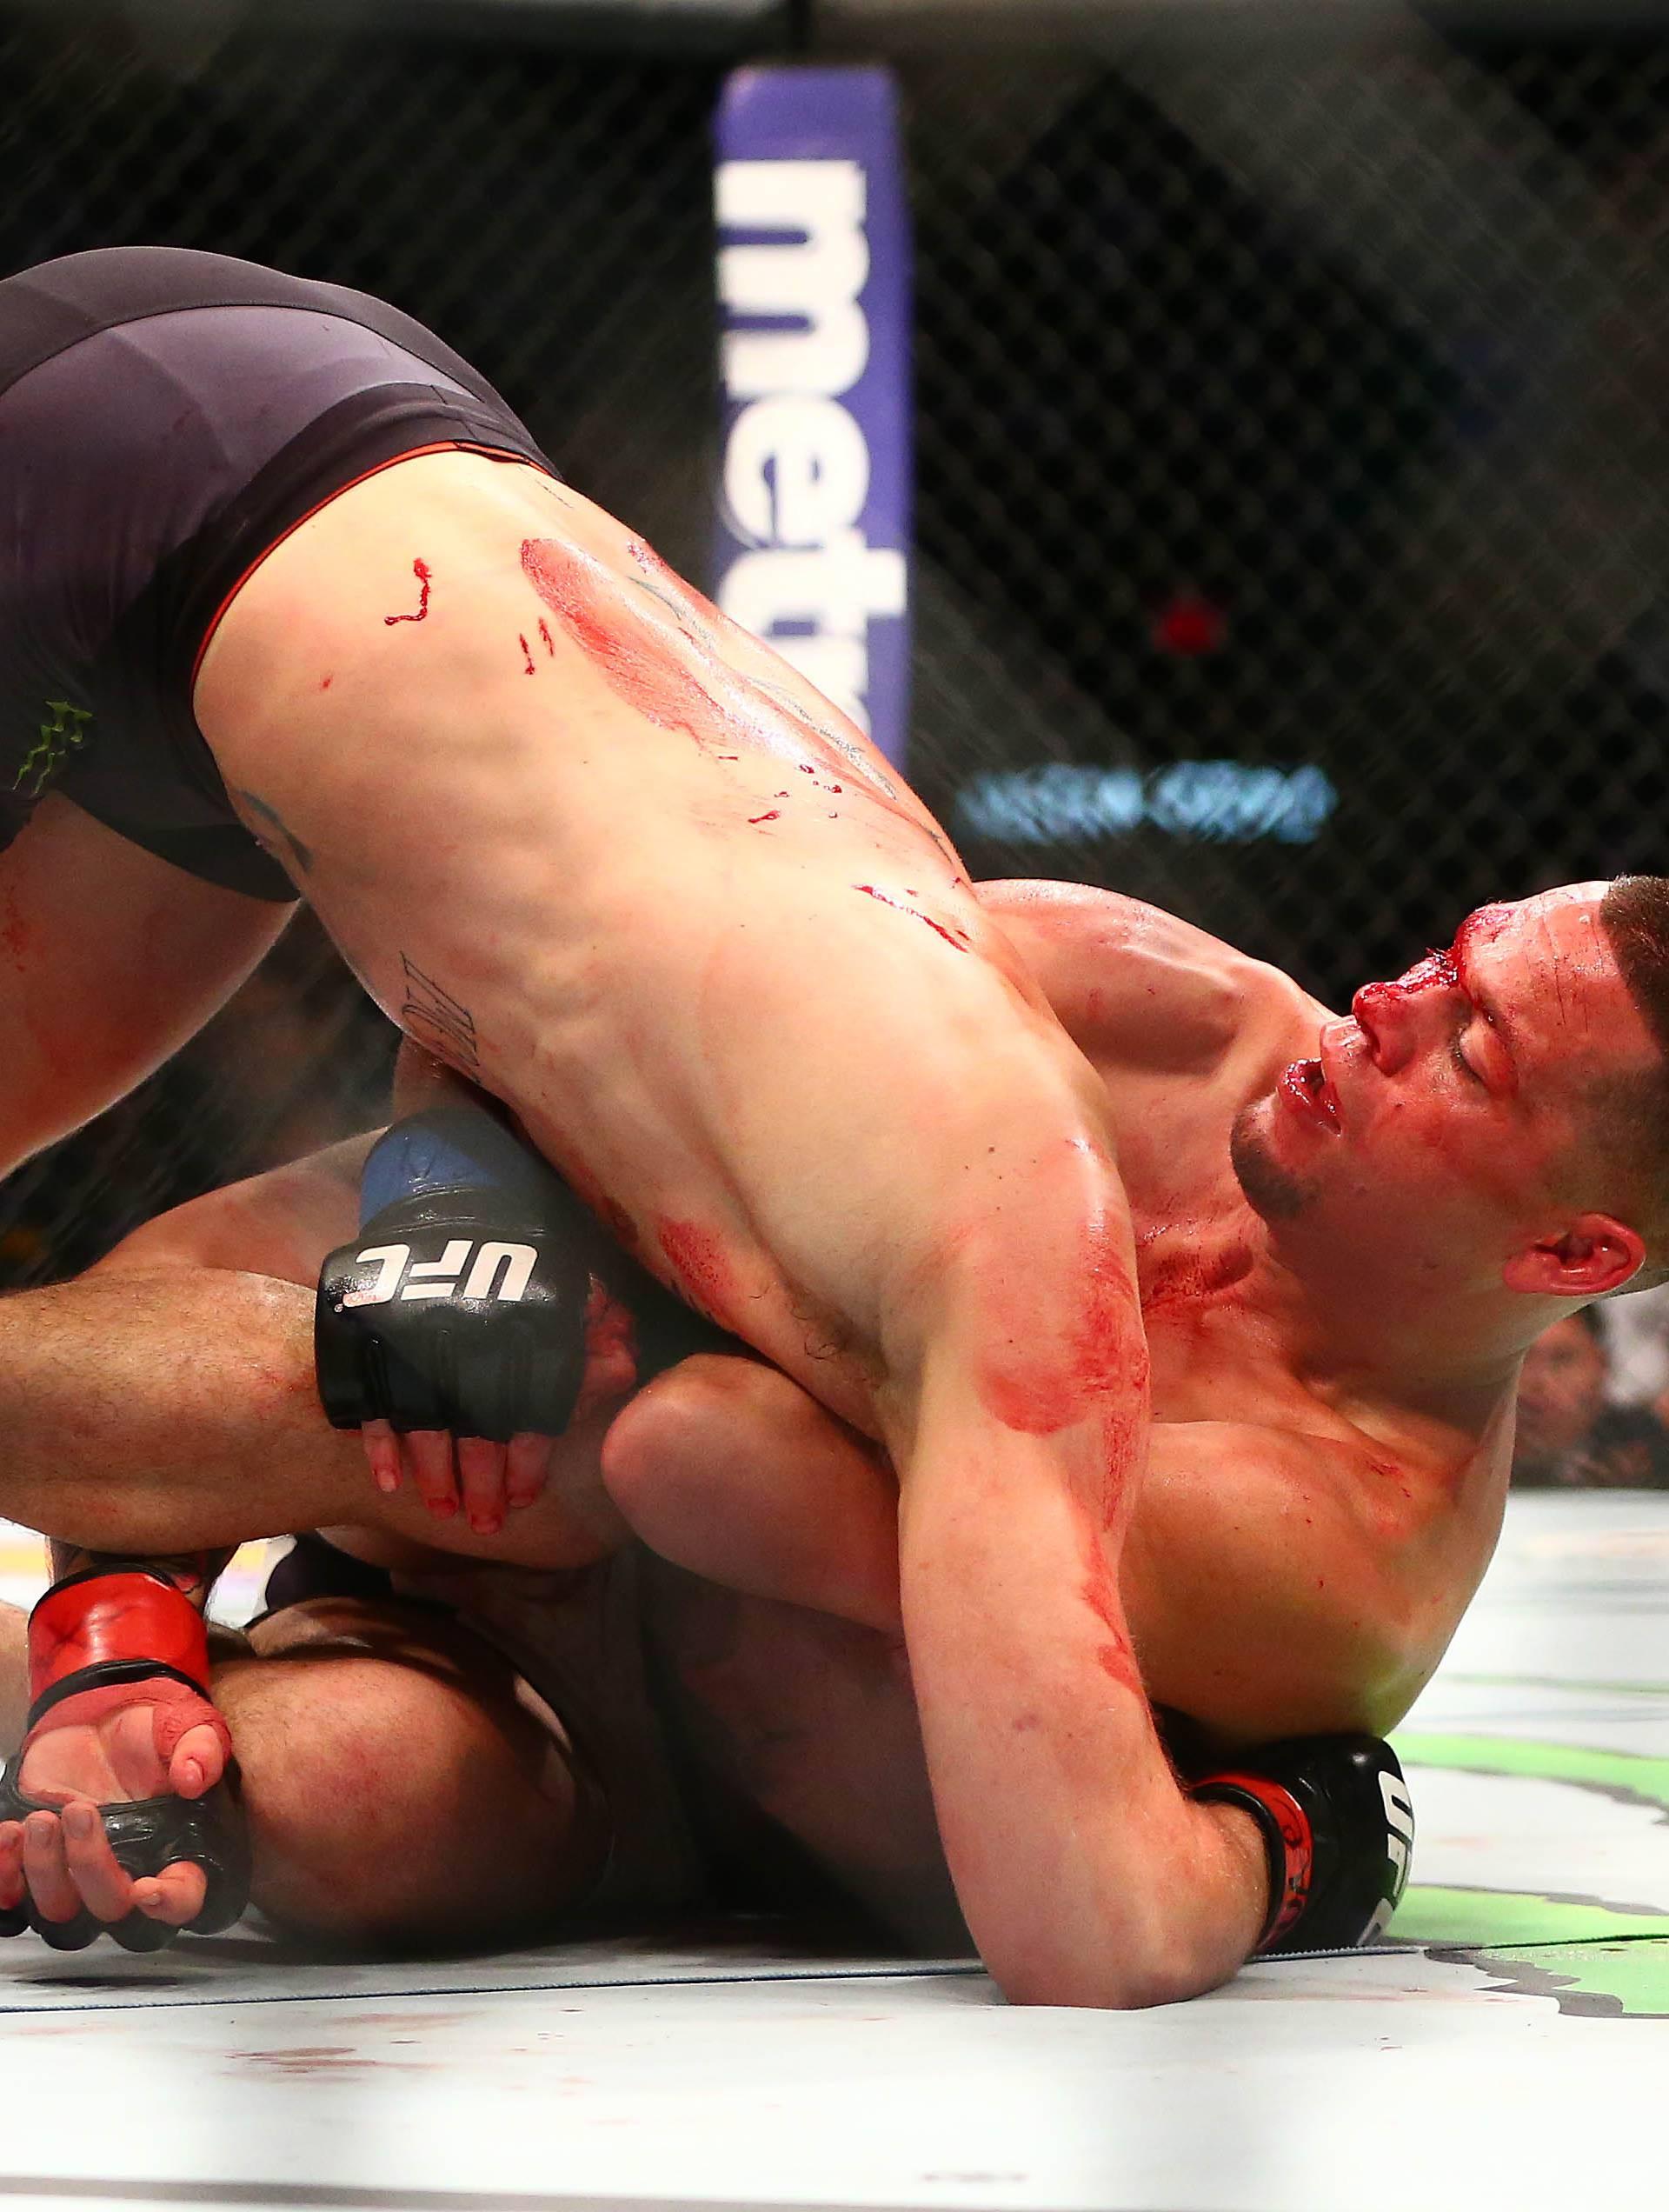 Zeus Tipado: Conor McGregor je odbio novu borbu s Diazom